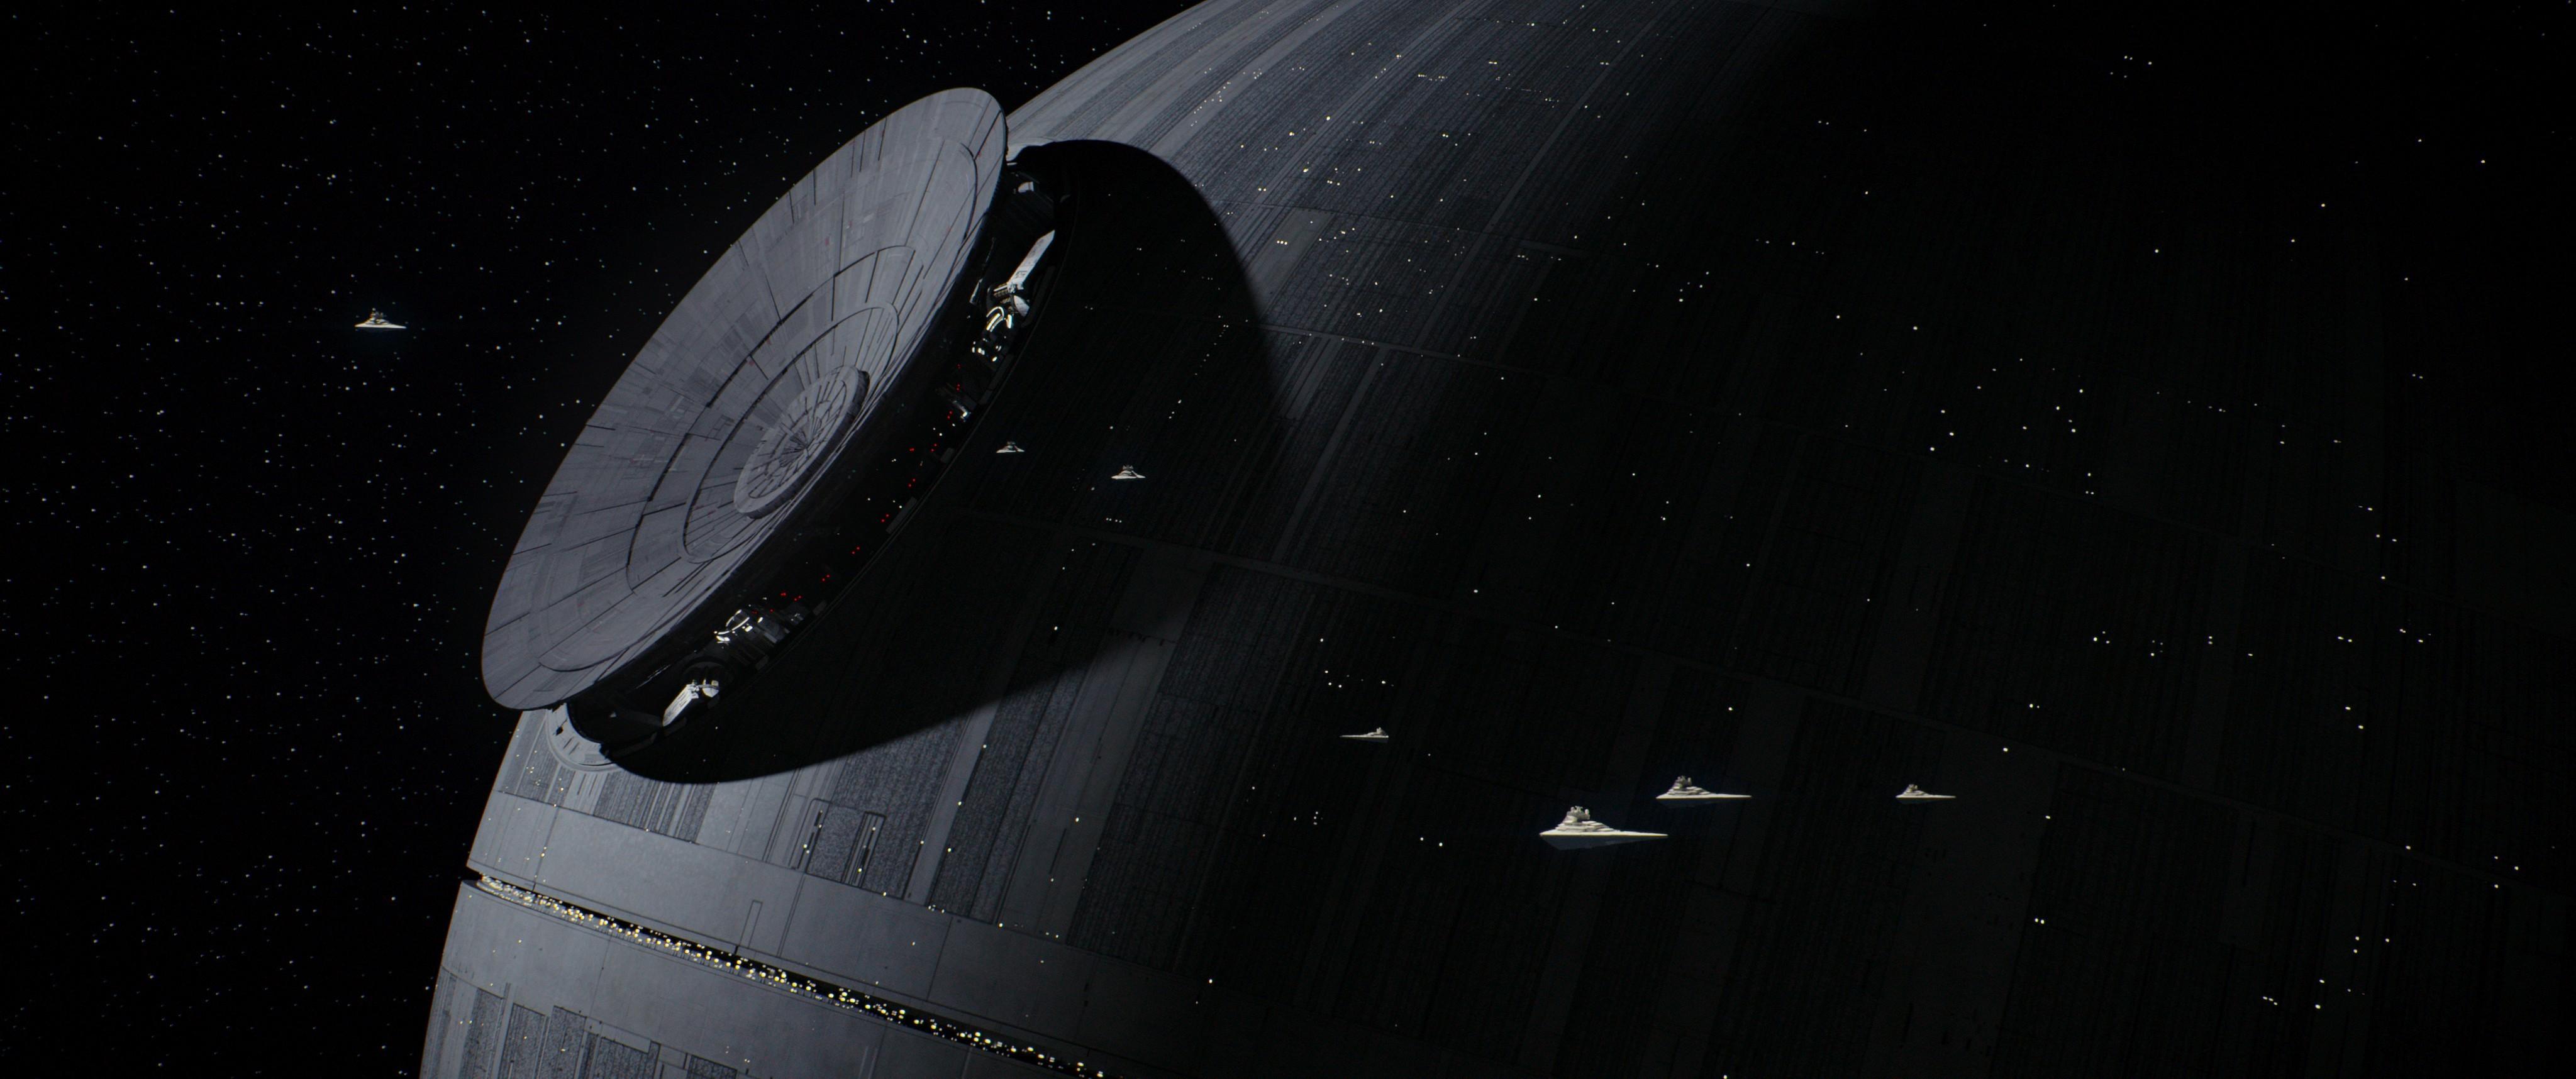 wallpaper rogue one a star wars story star ship best